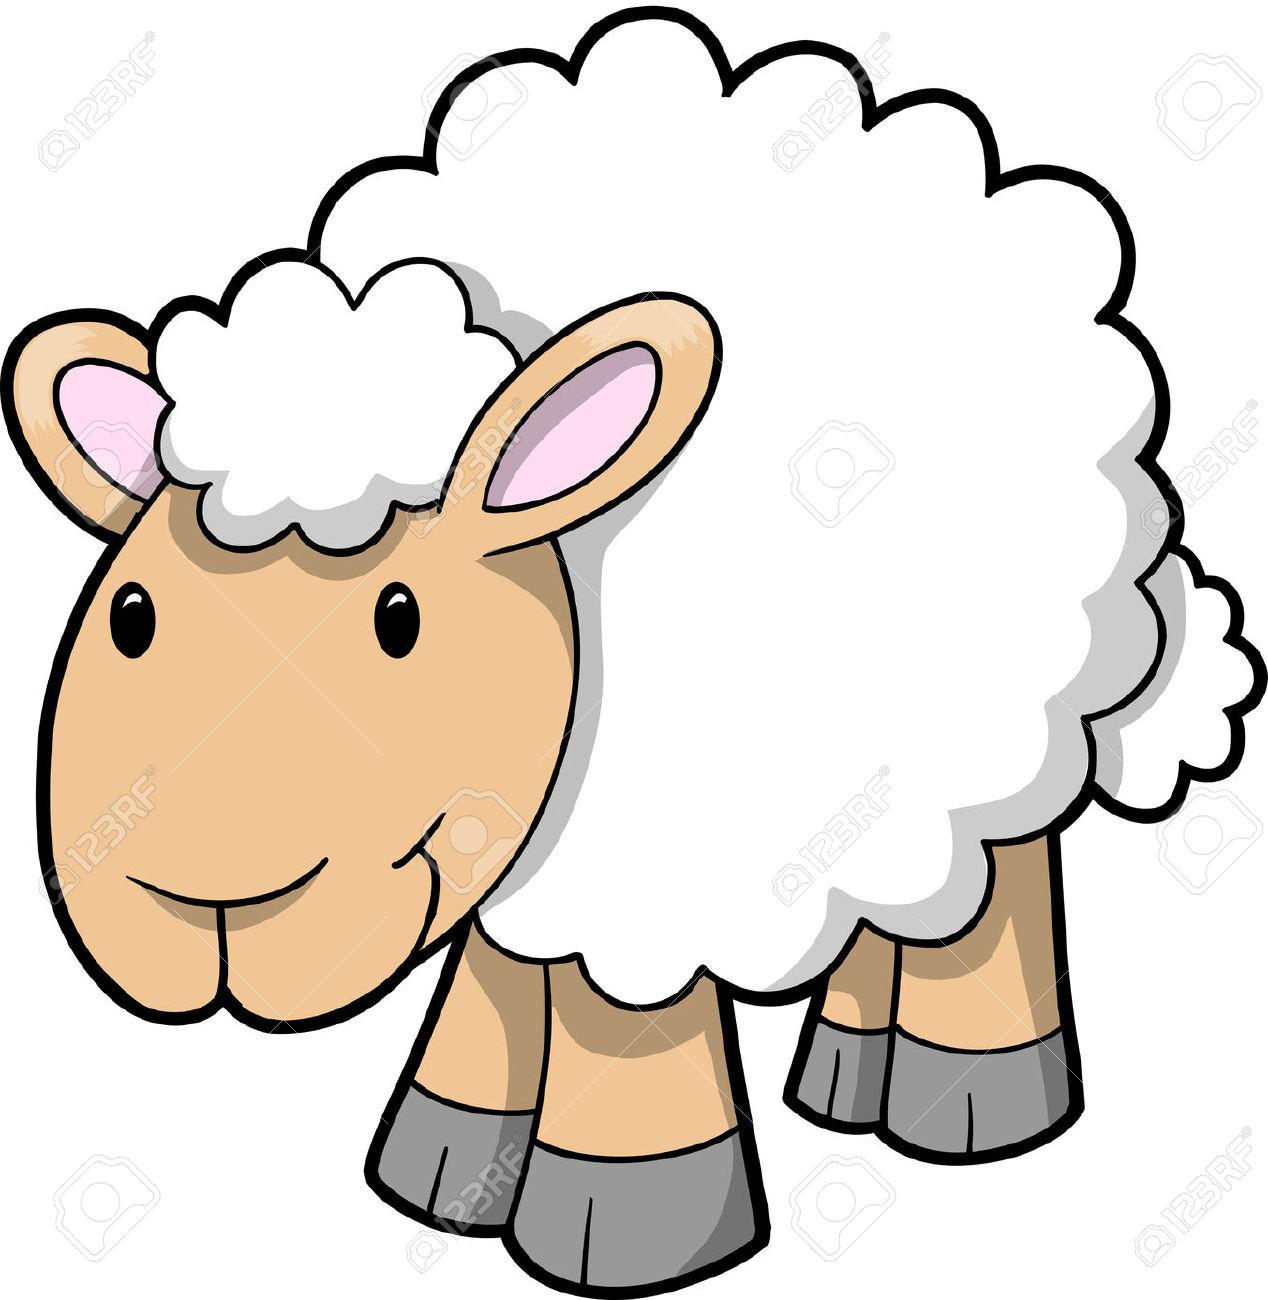 1268x1300 Free Sheep Clipart